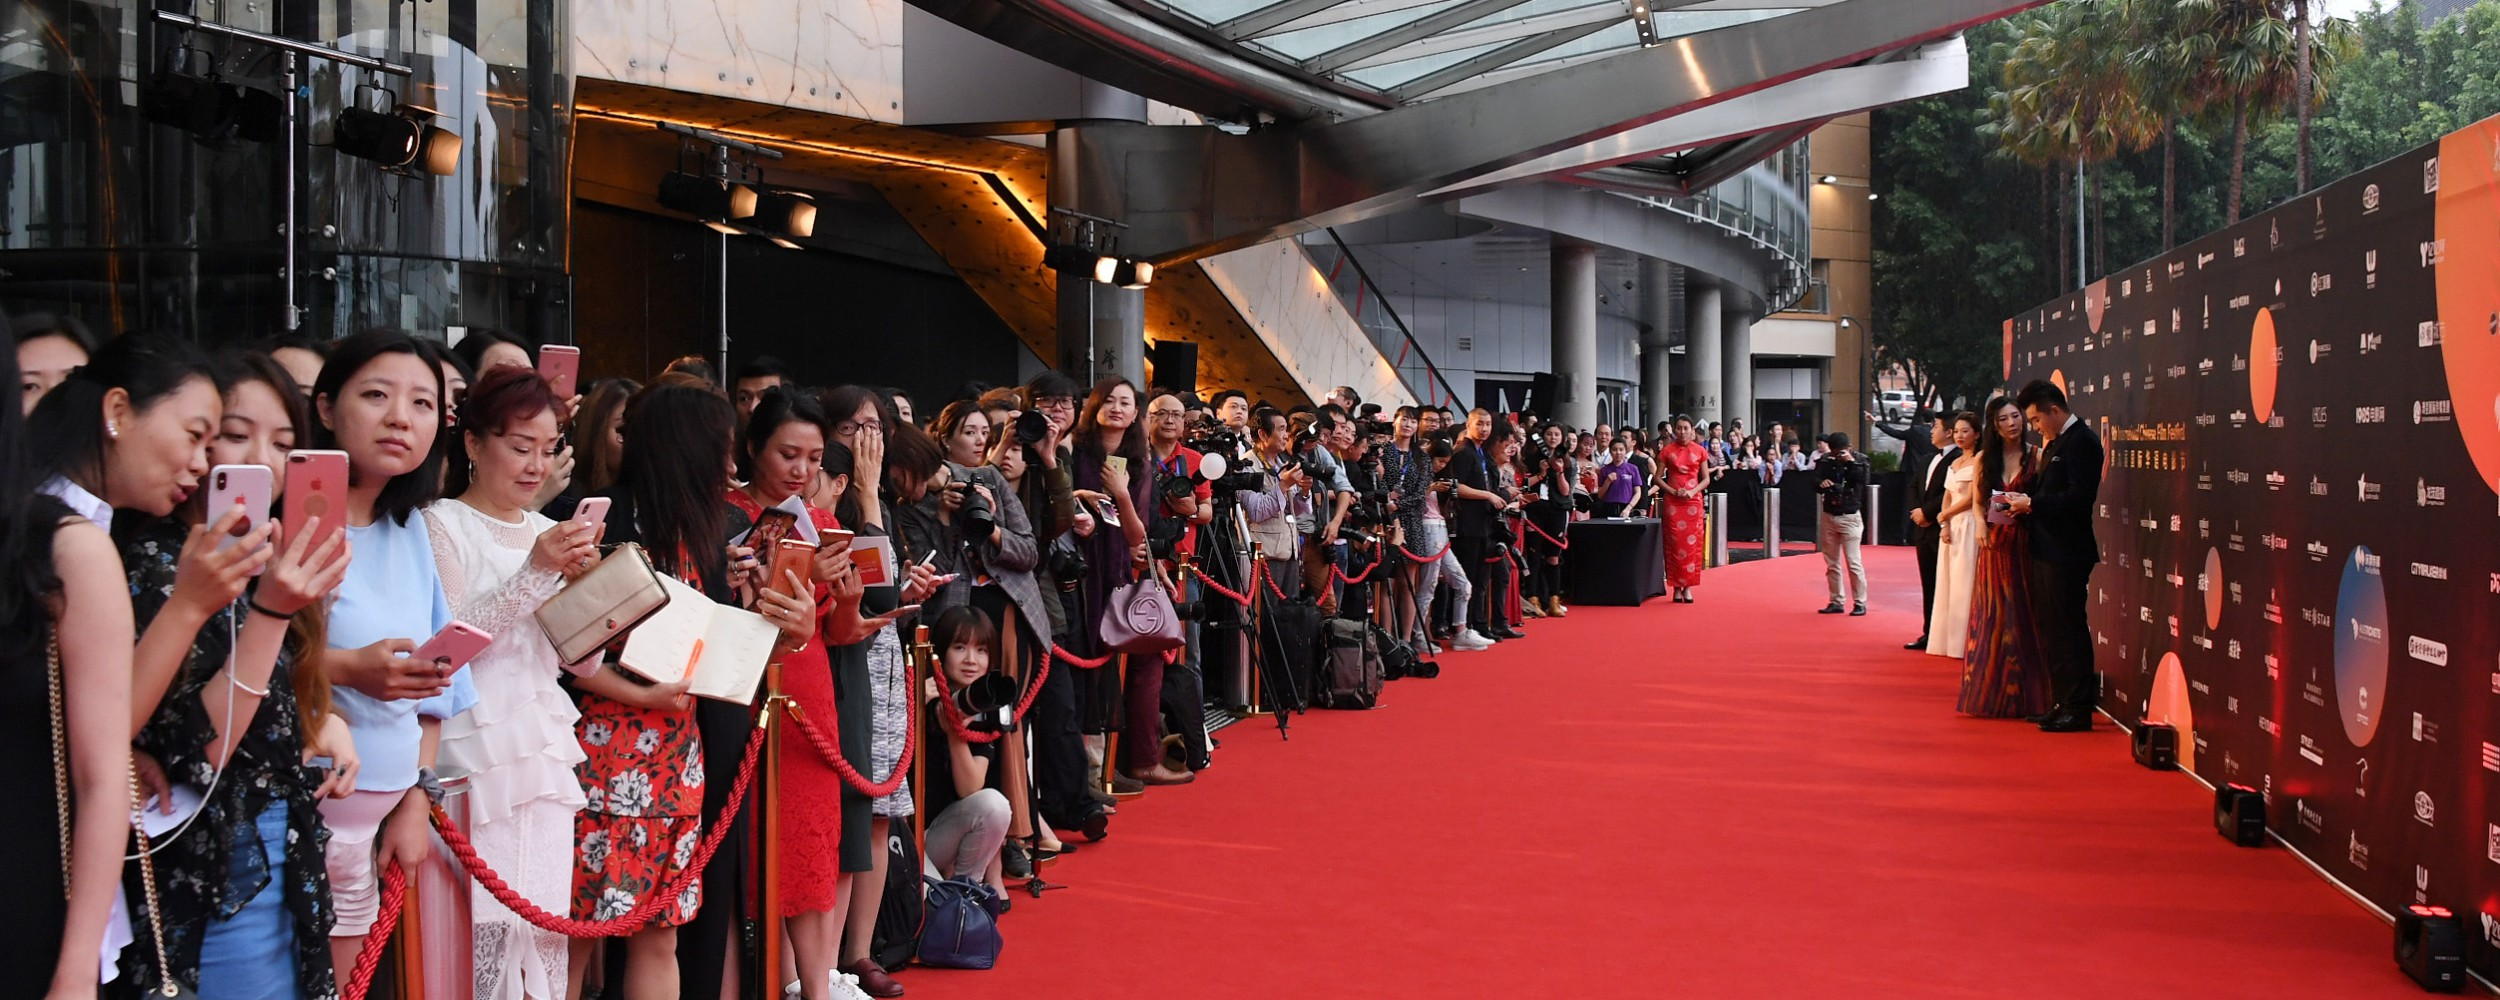 9th International Chinese Film Festival at The Star Sydney - Sunday 25th February, 2018 Photographer: Belinda Rolland © 2018